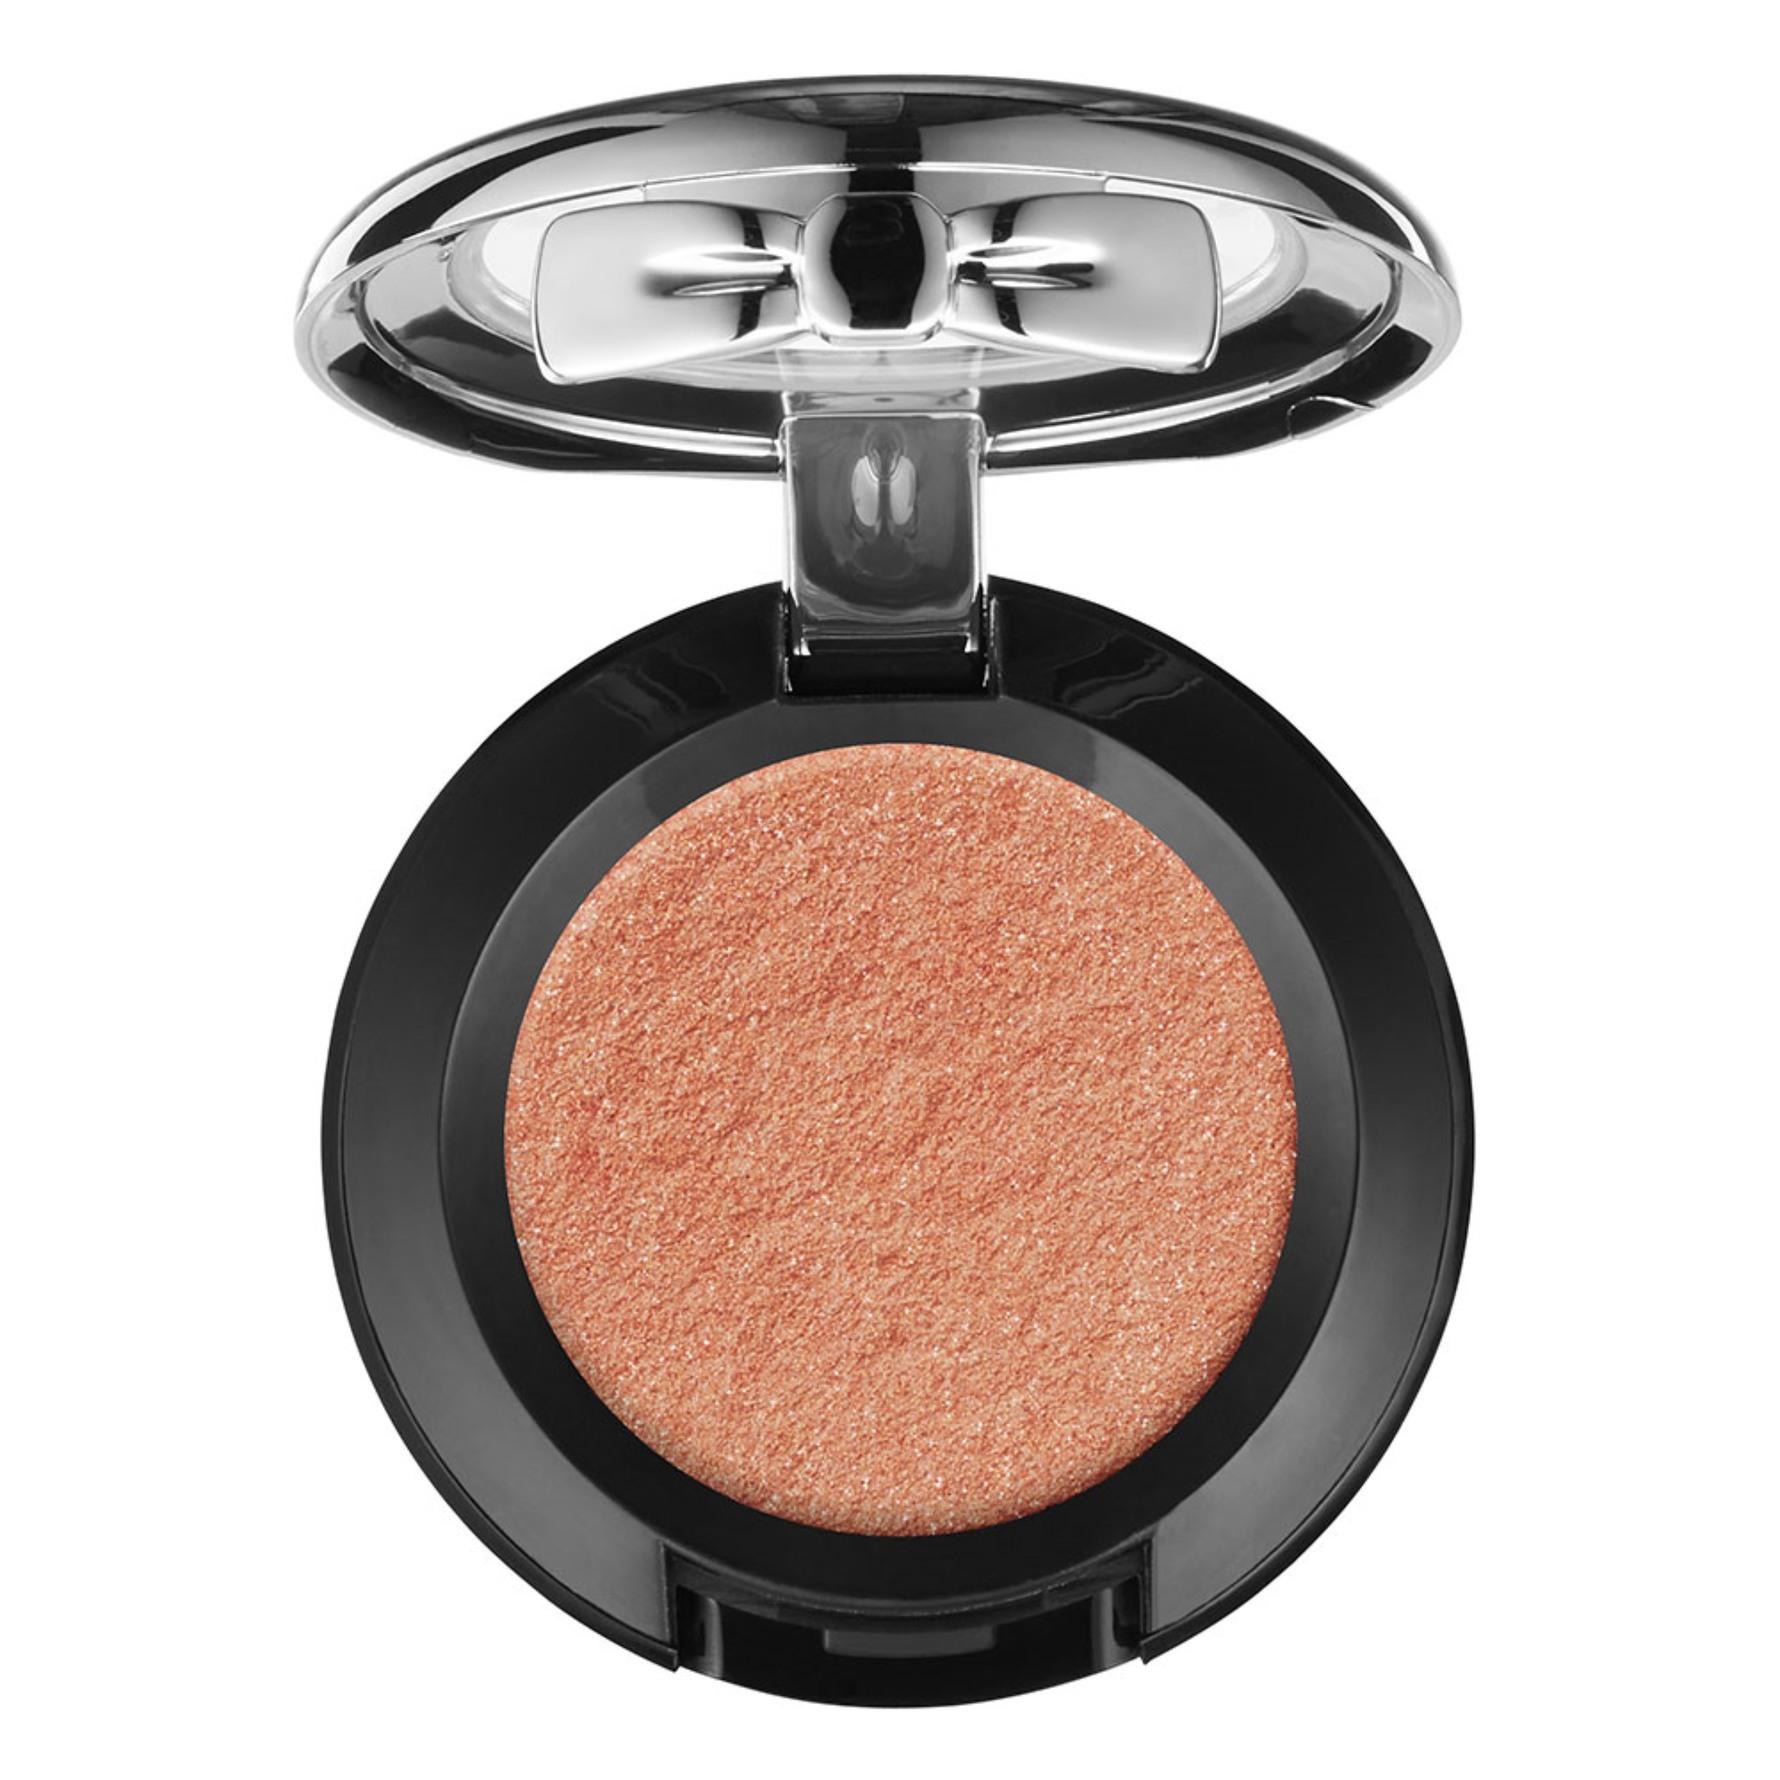 køb nyx professional makeup prismatic eye shadow rose dust